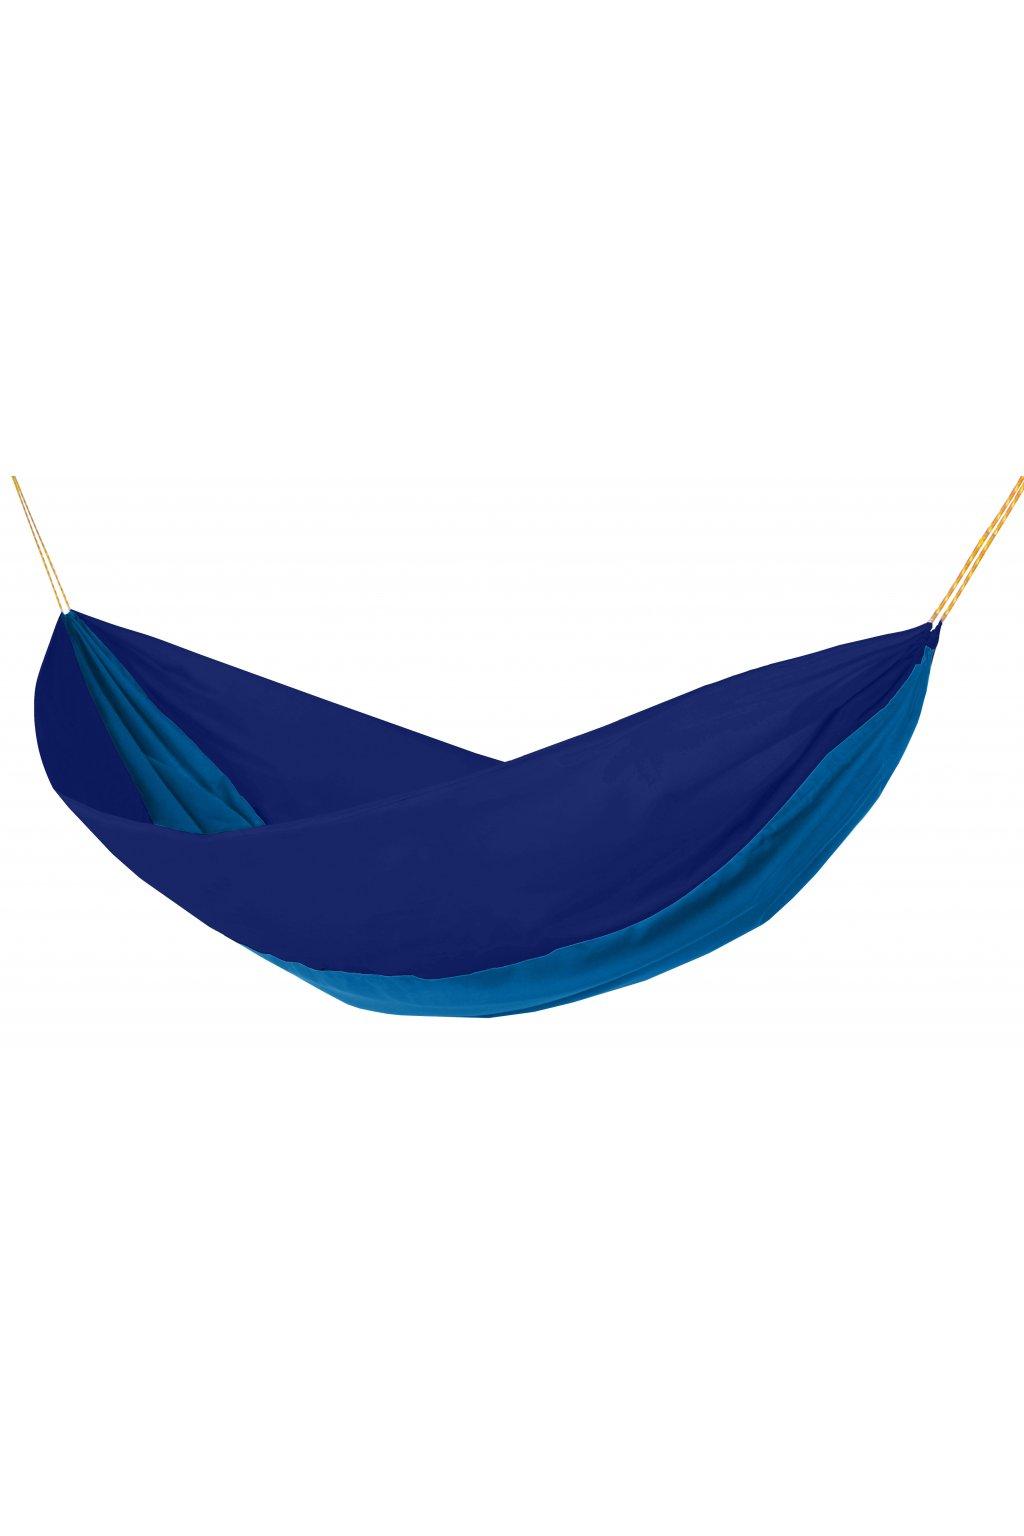 Houpací síť Hamaka originál pro jednoho modro-azurovo-modrá